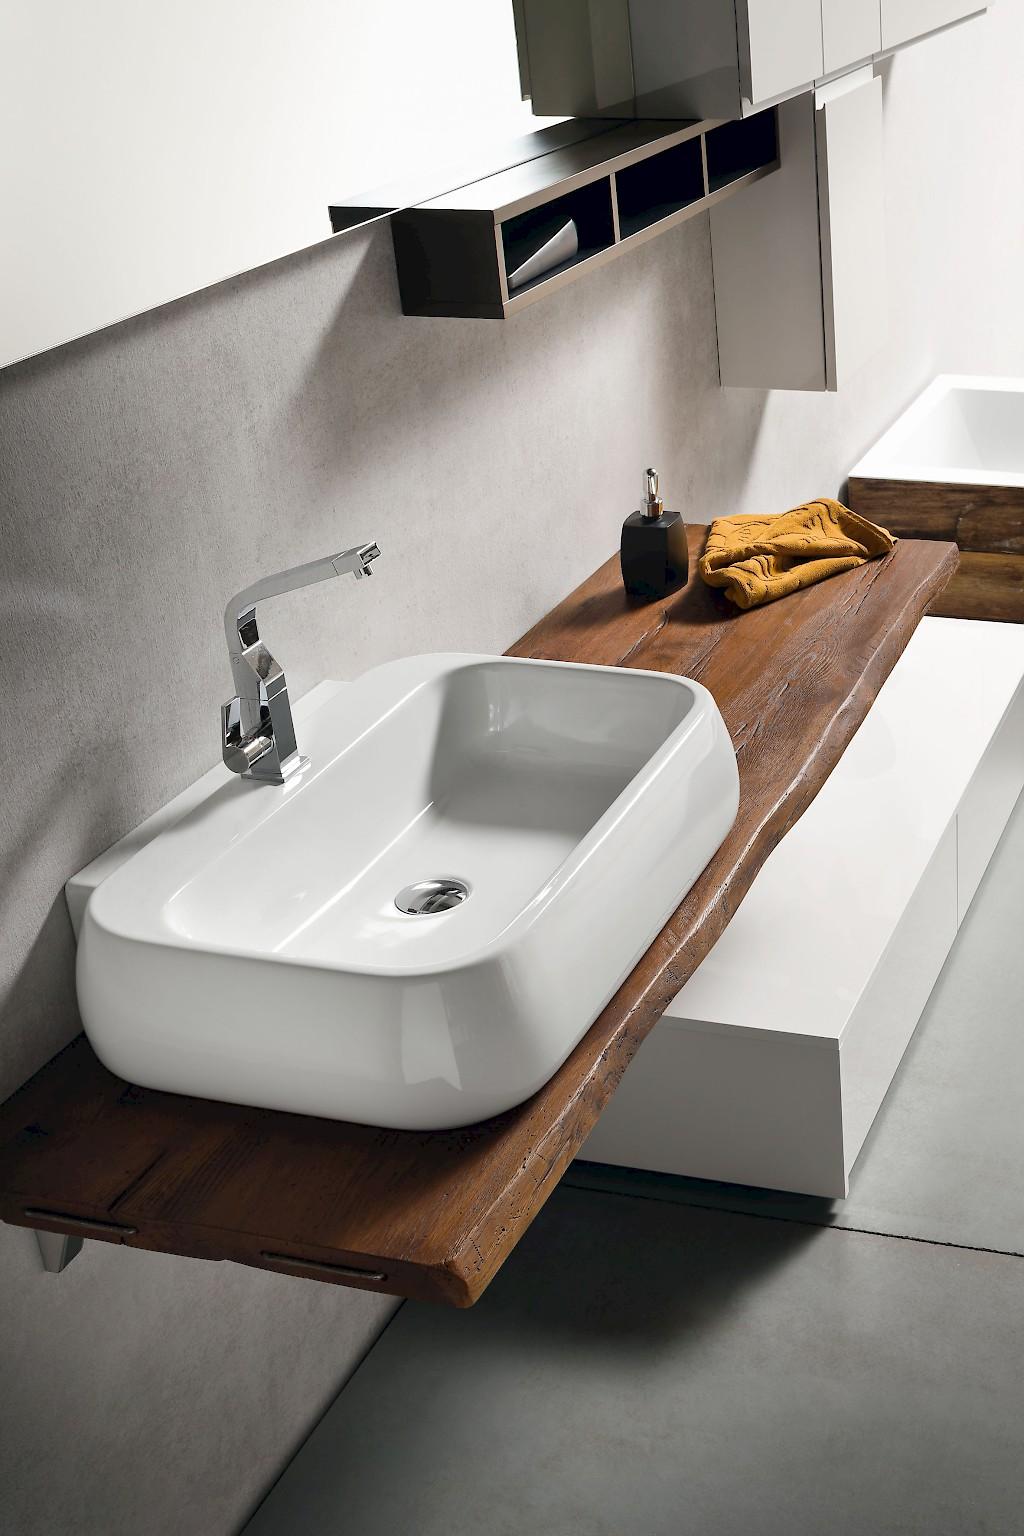 Top Bagno Legno Pictures - Modern Home Design - orangetech.us